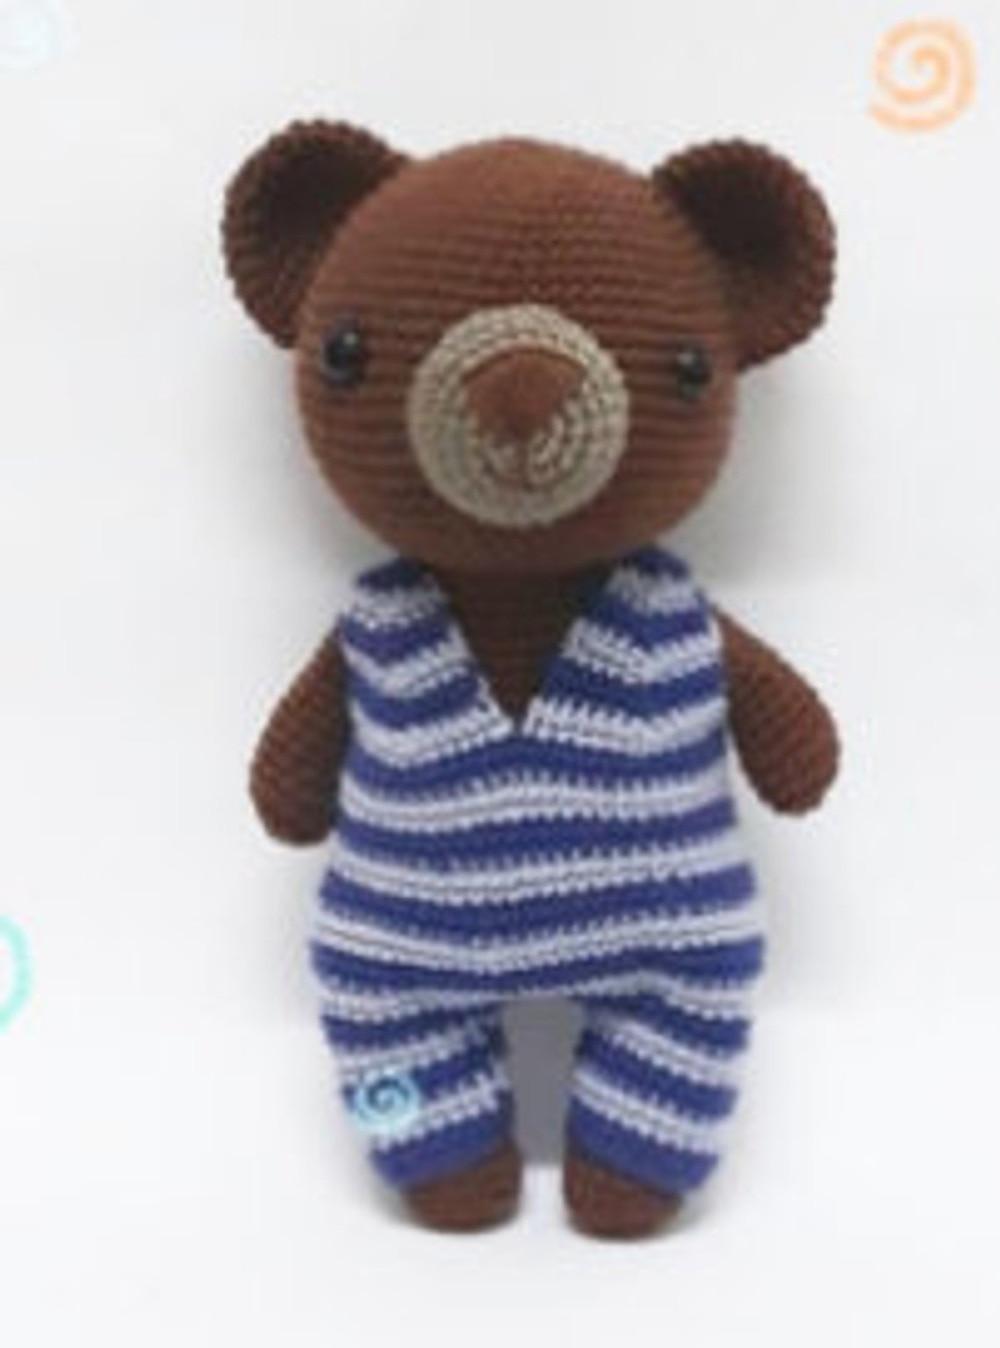 Crochet Toys  Amigurumi  Rattle  Fashion Doll B  Bear Umber  SQ0015